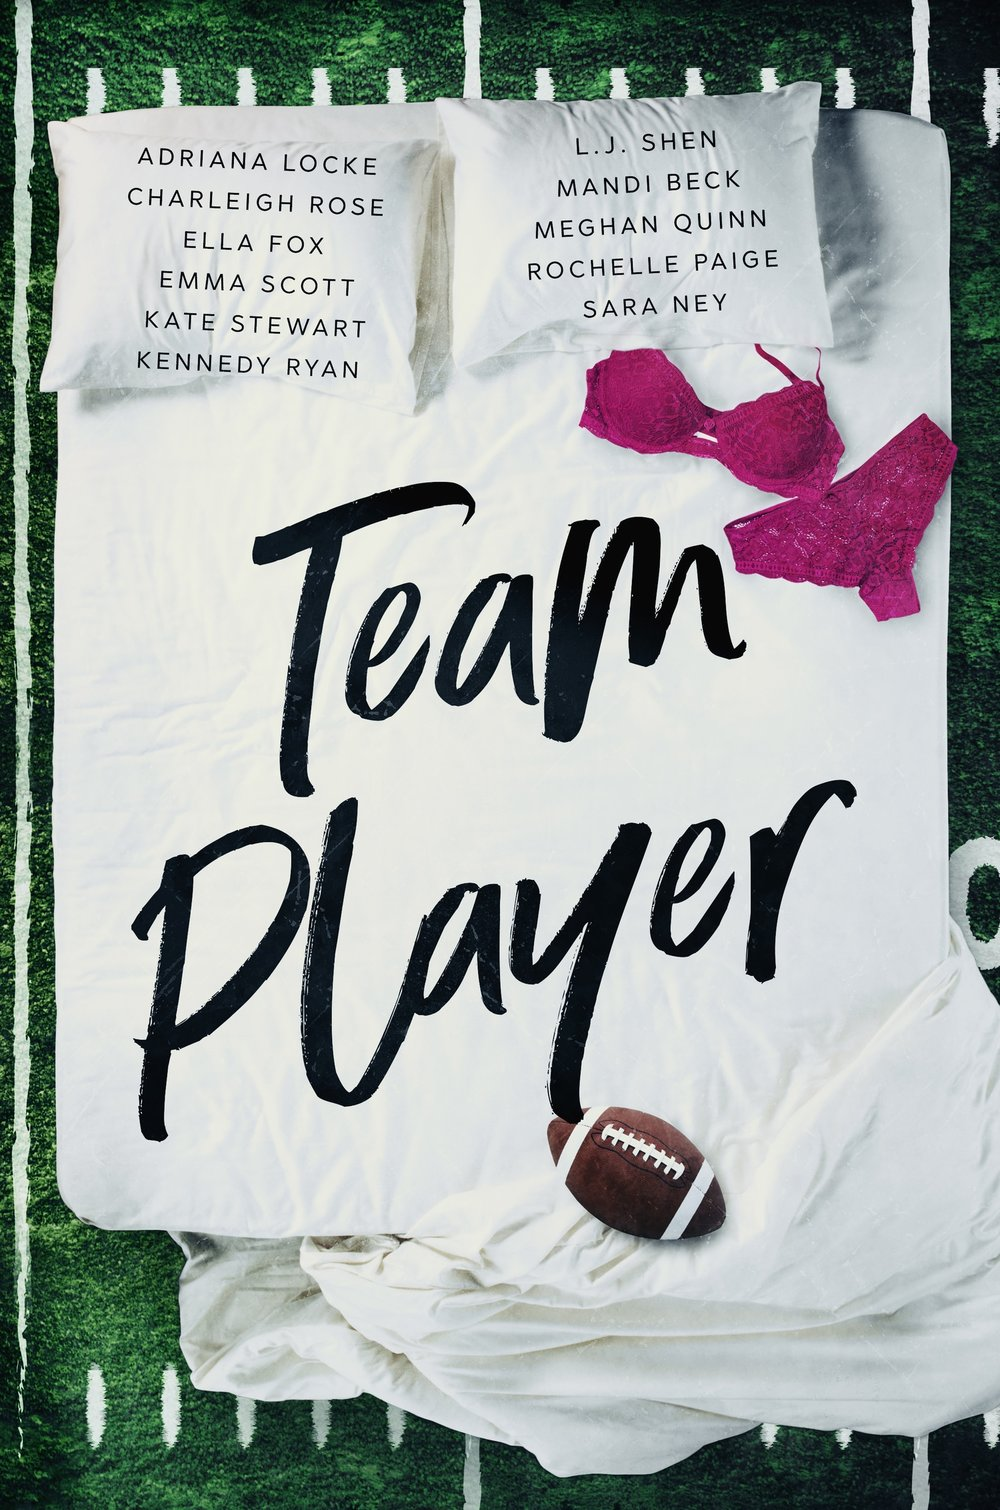 Team Player Anthology